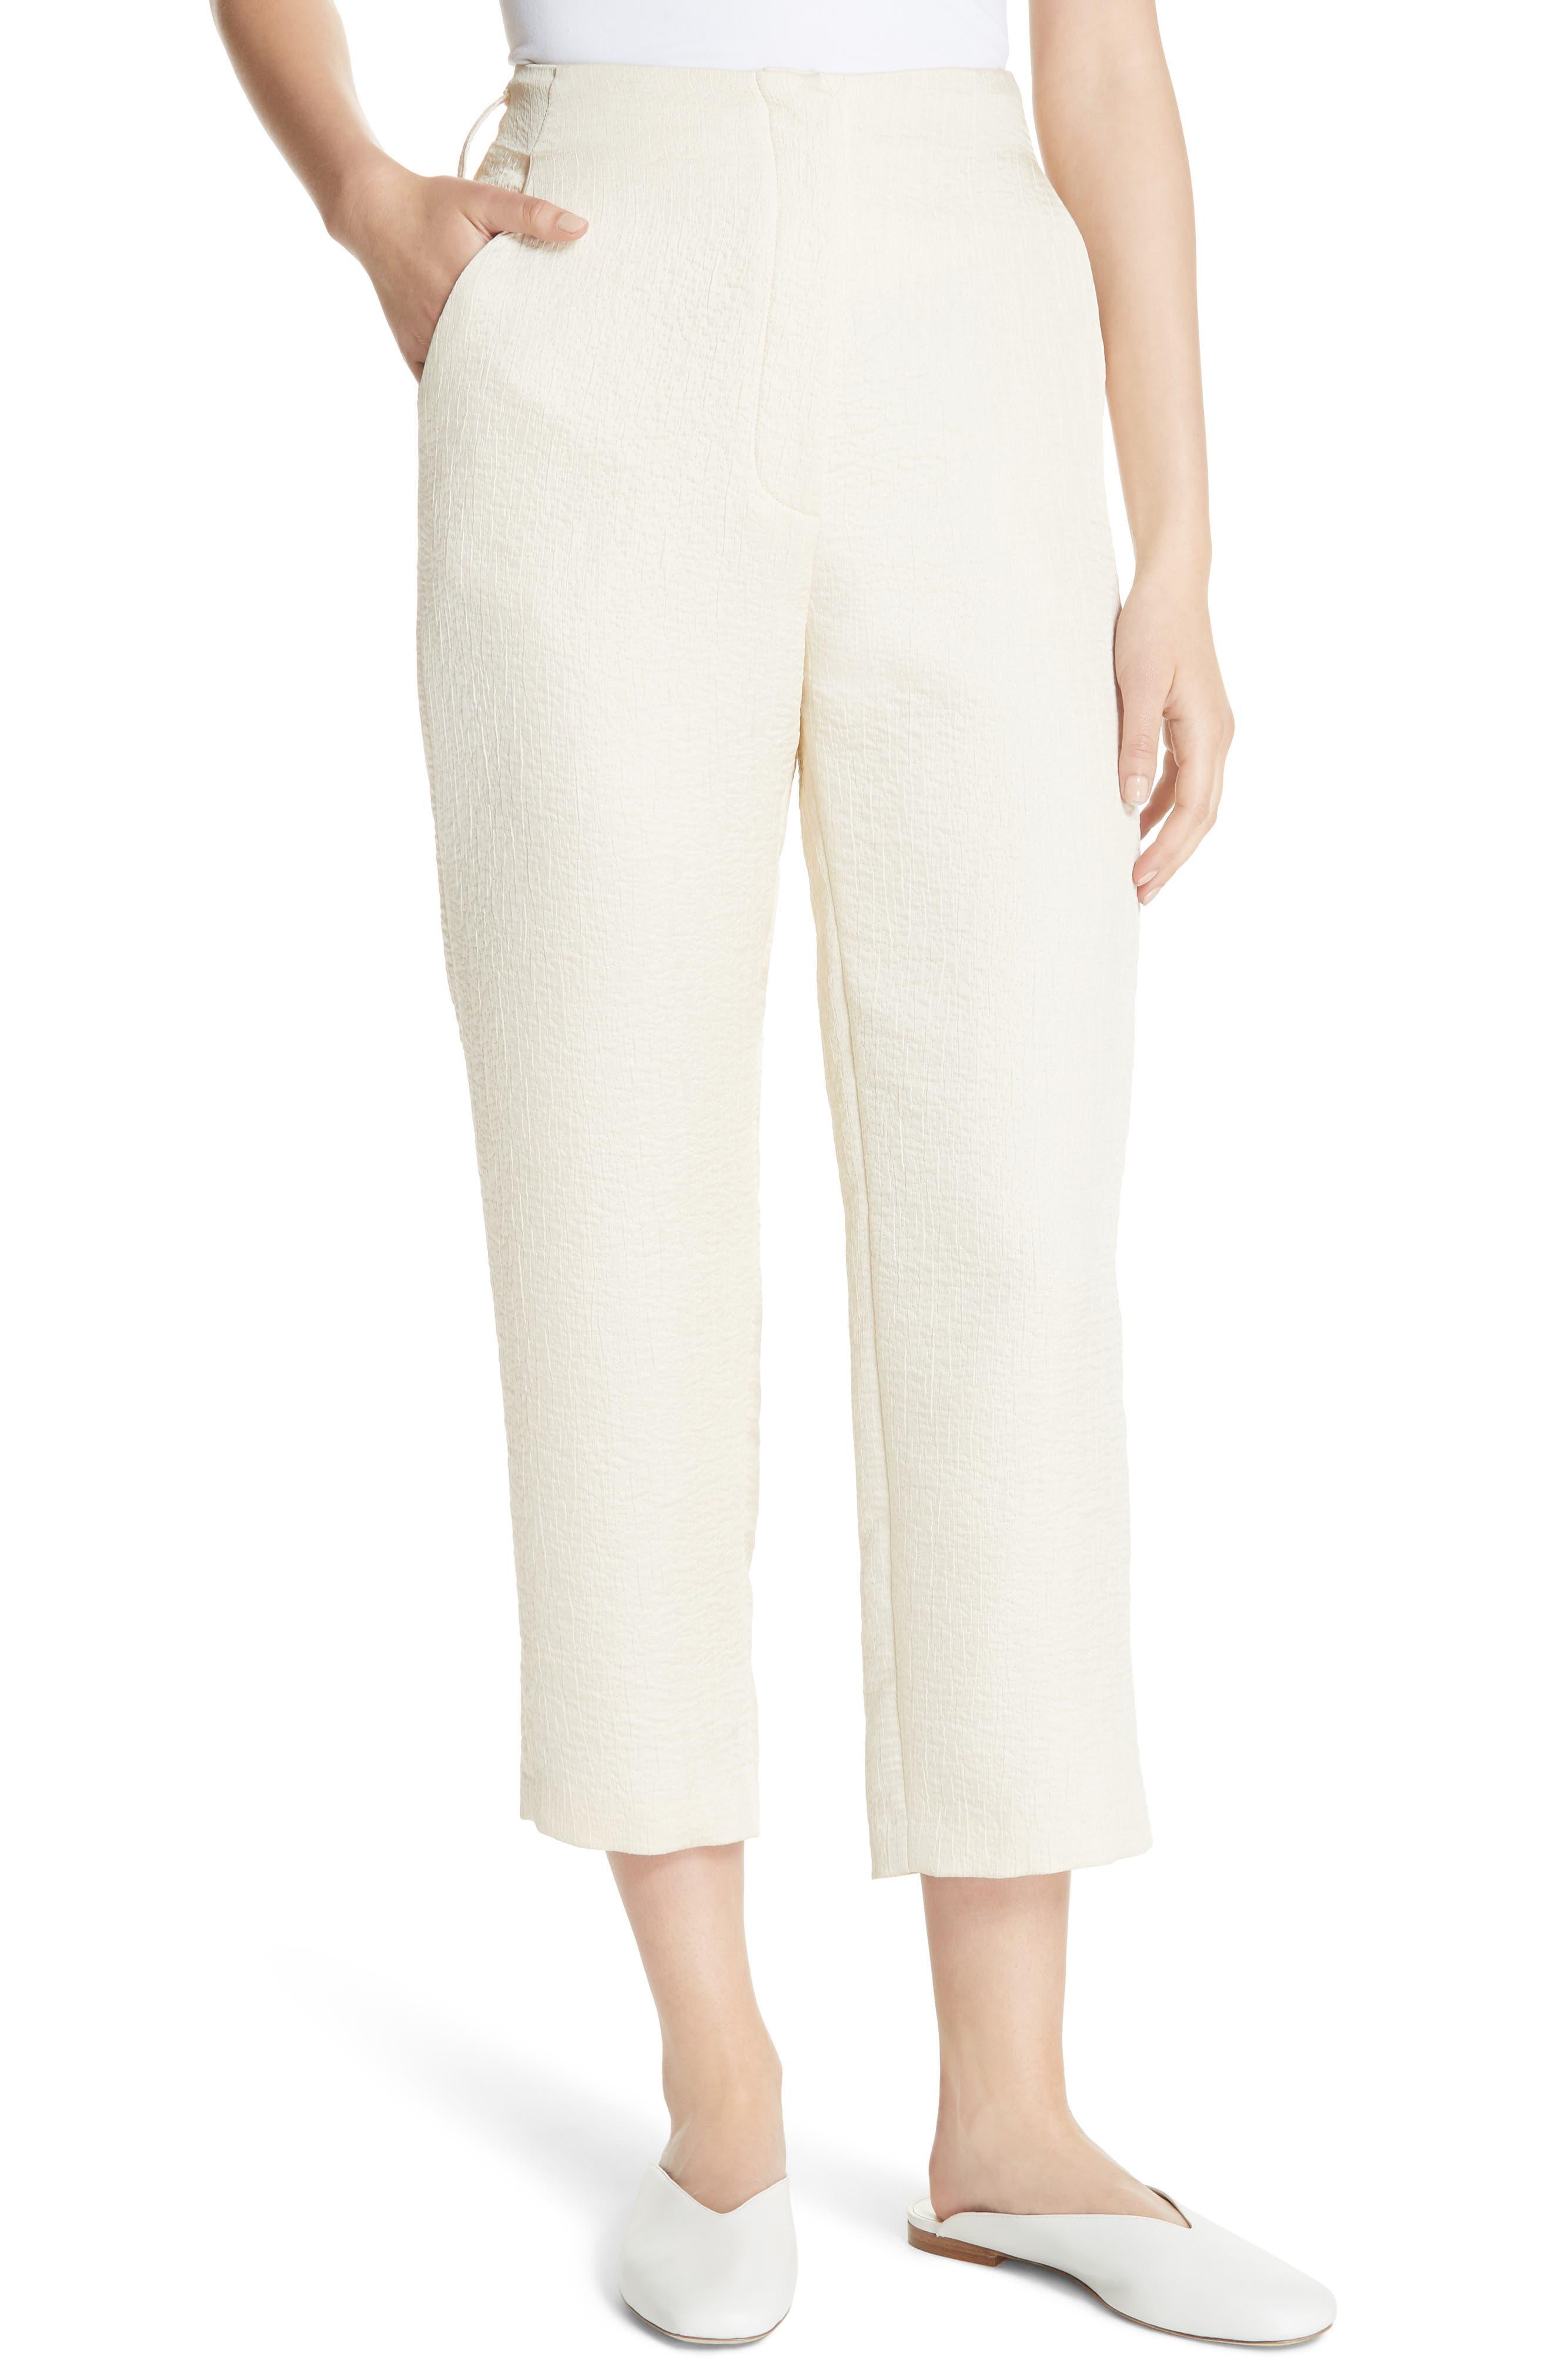 Raimo Belt Bag Crop Pants,                             Alternate thumbnail 4, color,                             900